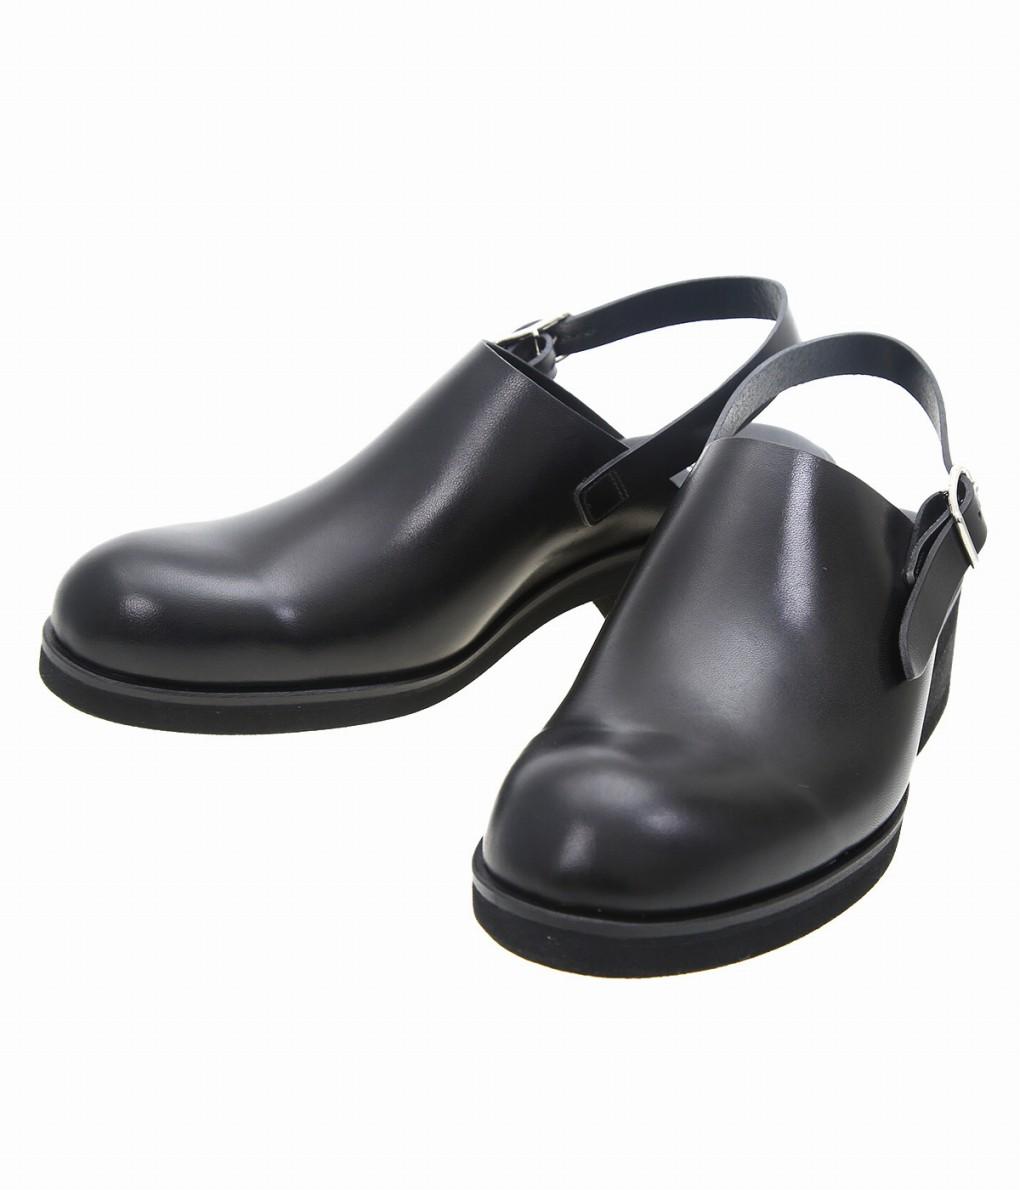 BEAUTIFUL SHOES / ビューティフルシューズ : SINGLEBELTCLOGS : スリッポンタイプ サンダル レザーシューズ ベルトストラップ 靴 レディース : BSS1912004 【ANN】